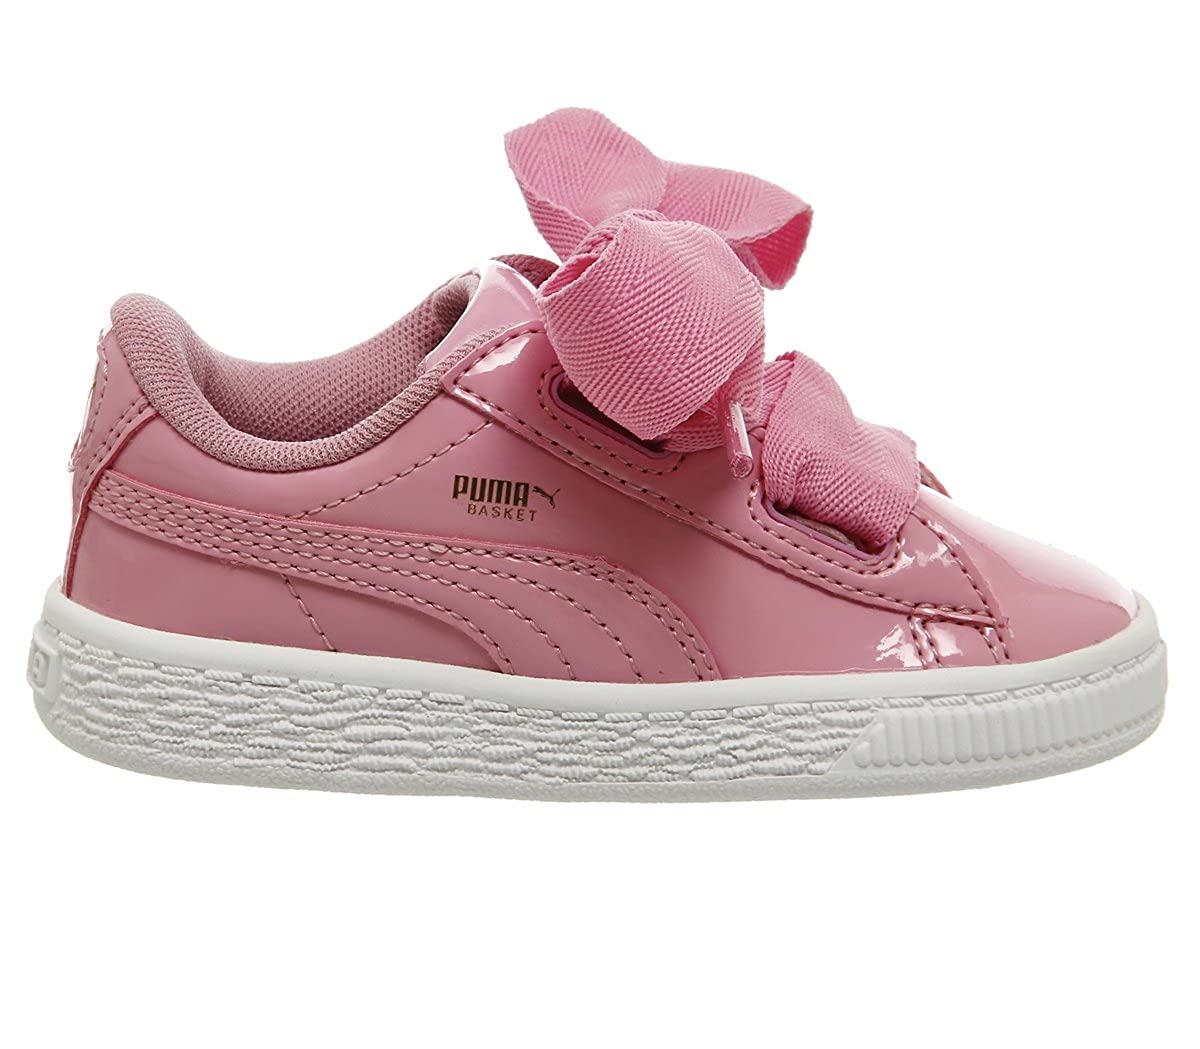 Puma Basket Heart Patent Inf, Sneakers Basses Mixte Enfant 363353